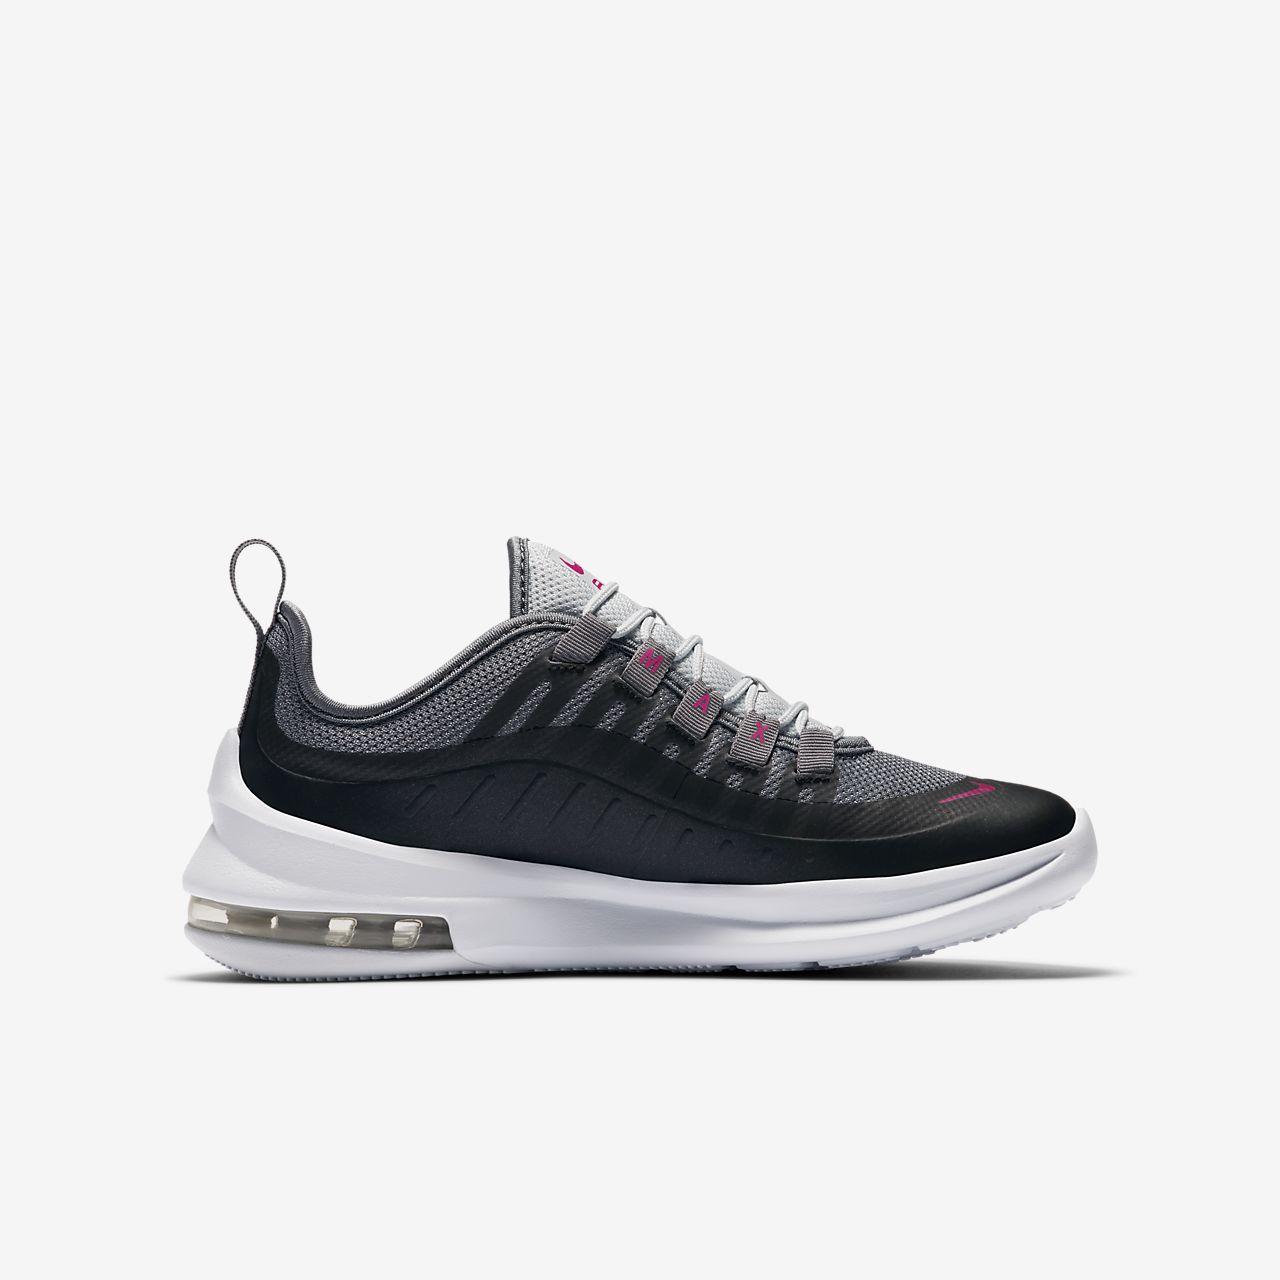 timeless design 020ee 2822b ... Nike Air Max Axis Older Kids  Shoe